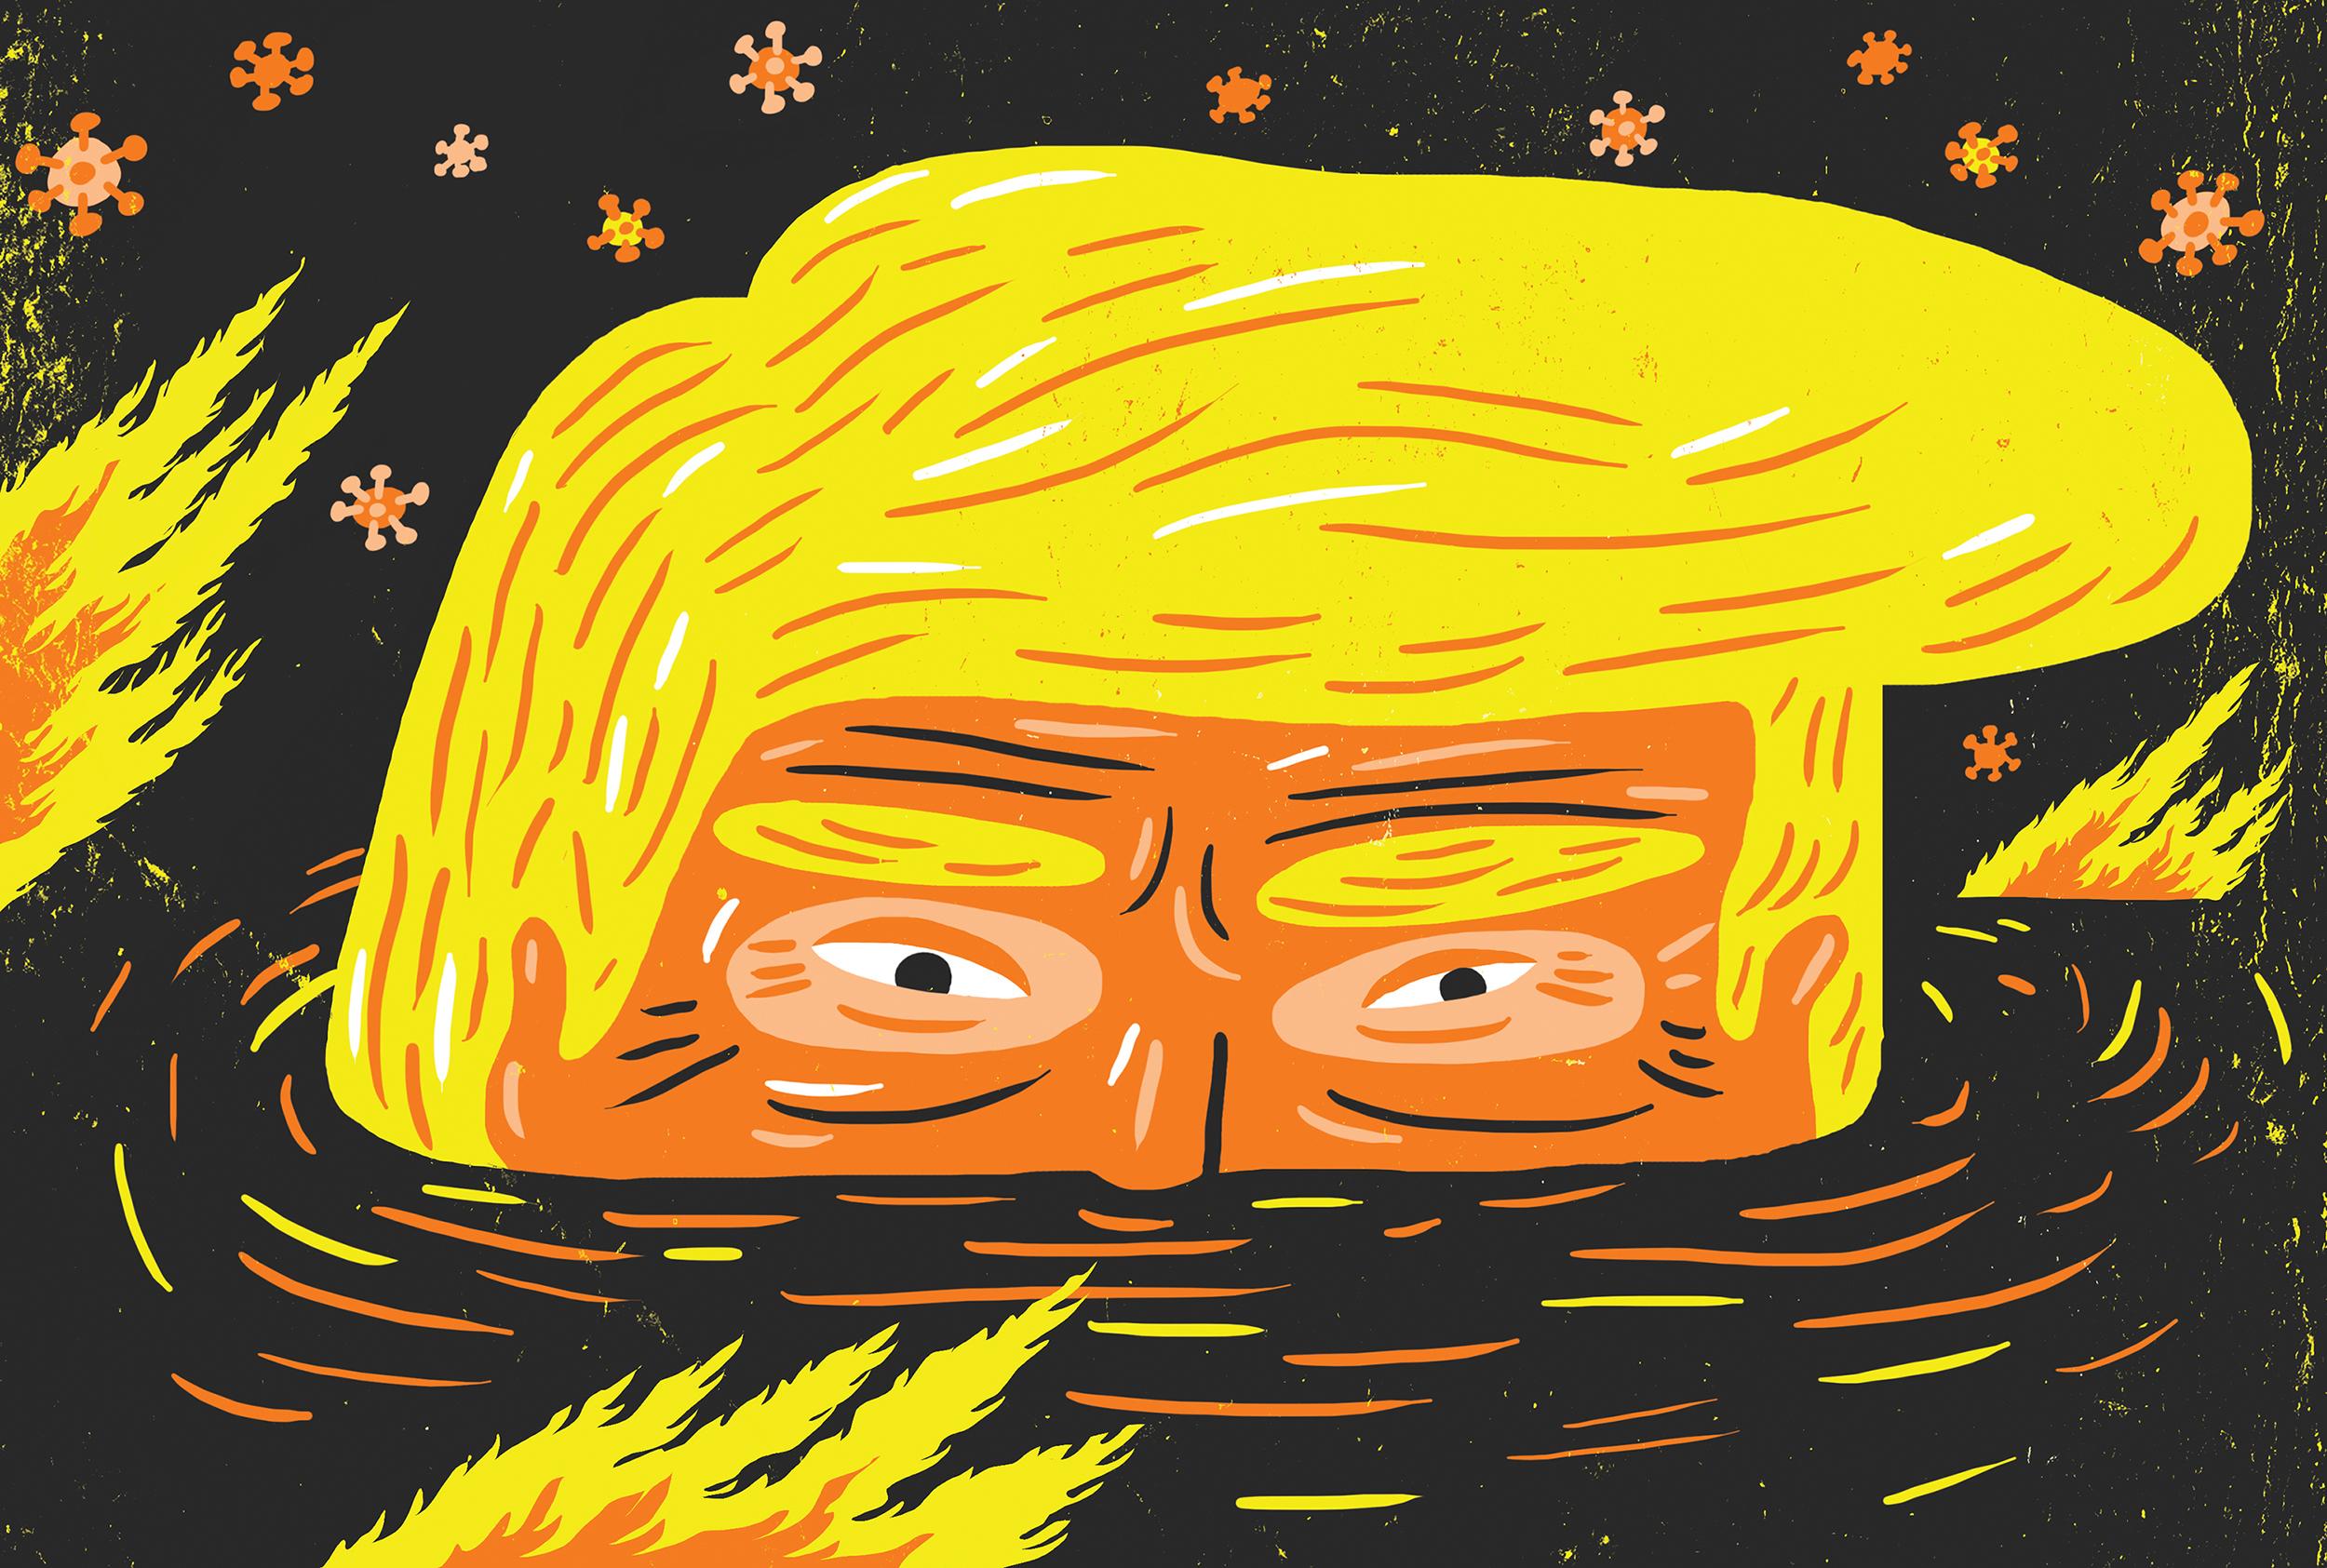 Theispot Com Oivind Hovland Illustrates The Trump Swamp